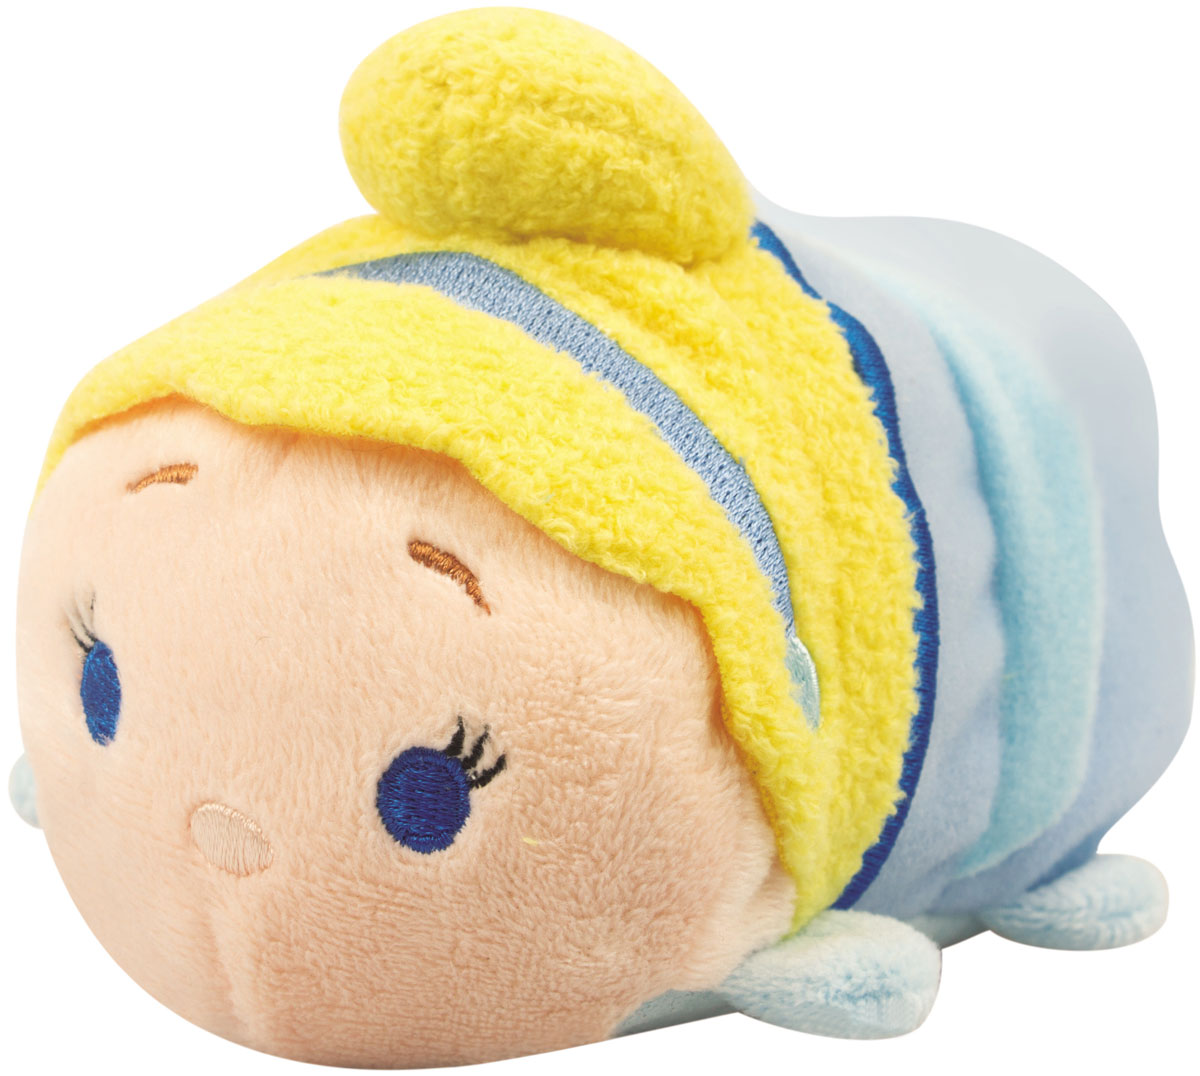 Tsum Tsum Мягкая озвученная игрушка Cindy 12 см fairyland pukifee cupid bjd resin figures luts ai yosd volks kit doll not for sales toy baby tsum reborn dolls